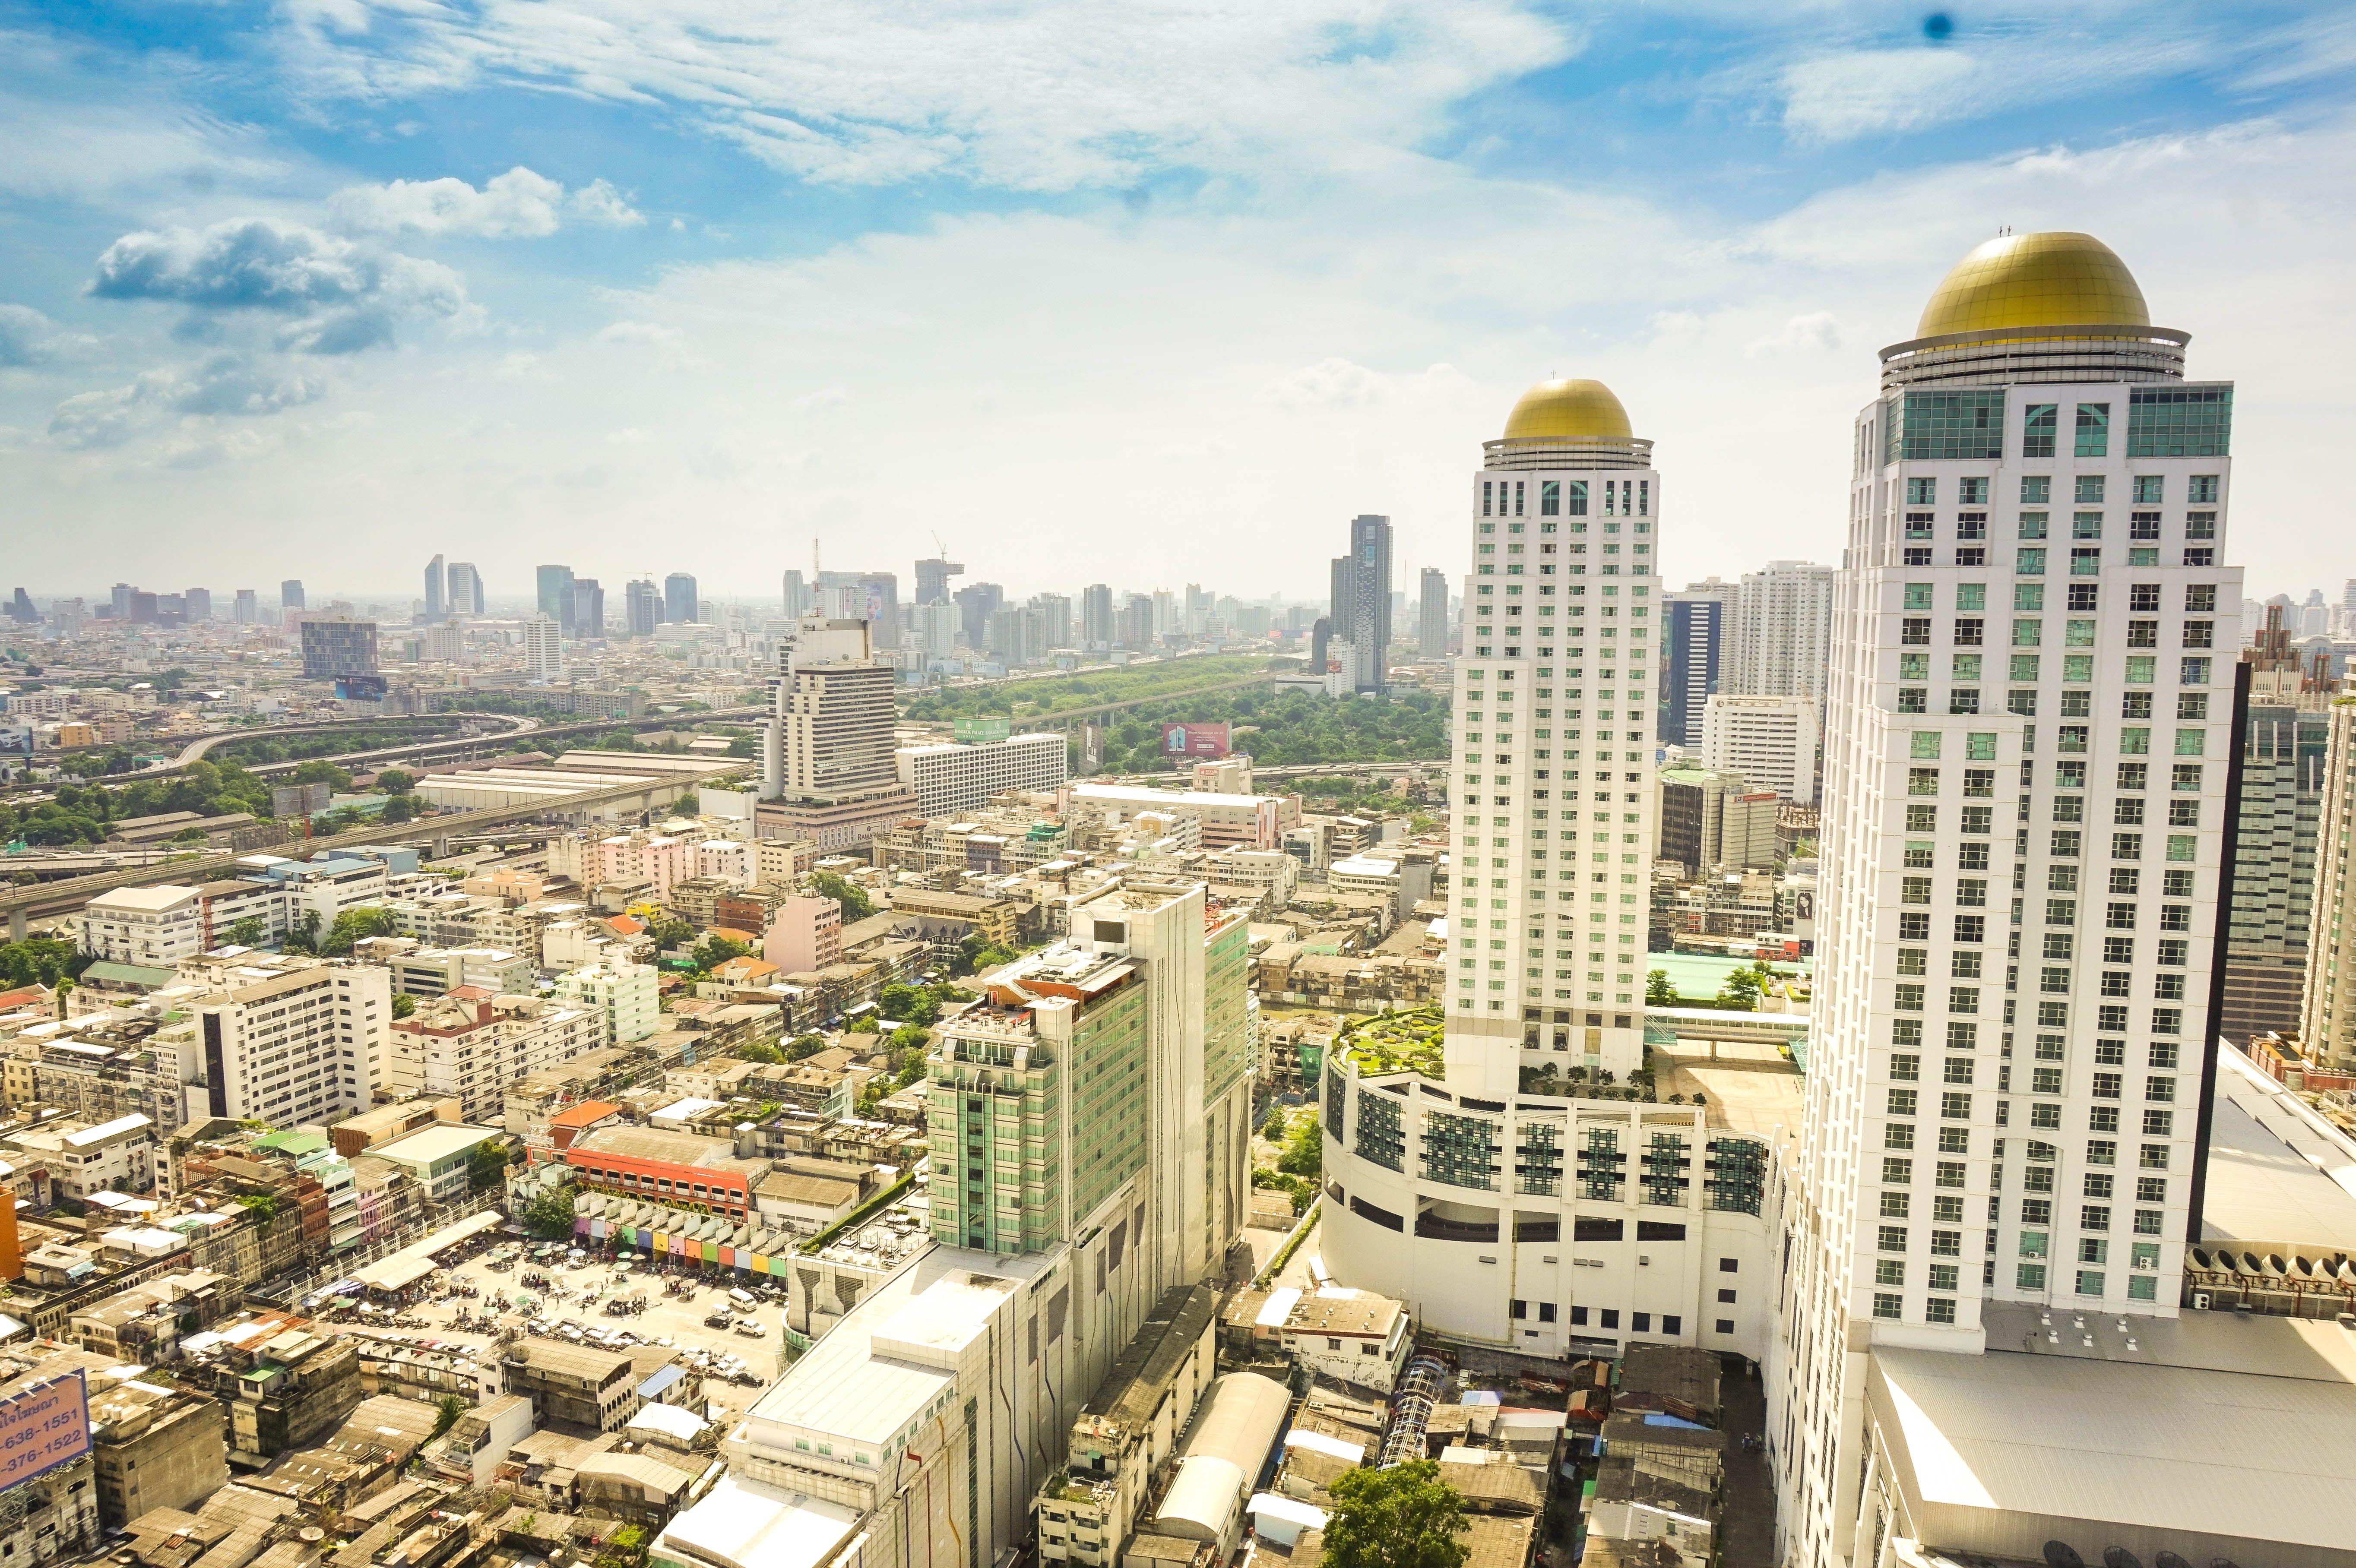 Pin by fresheatherblog on Thailand Bangkok, San